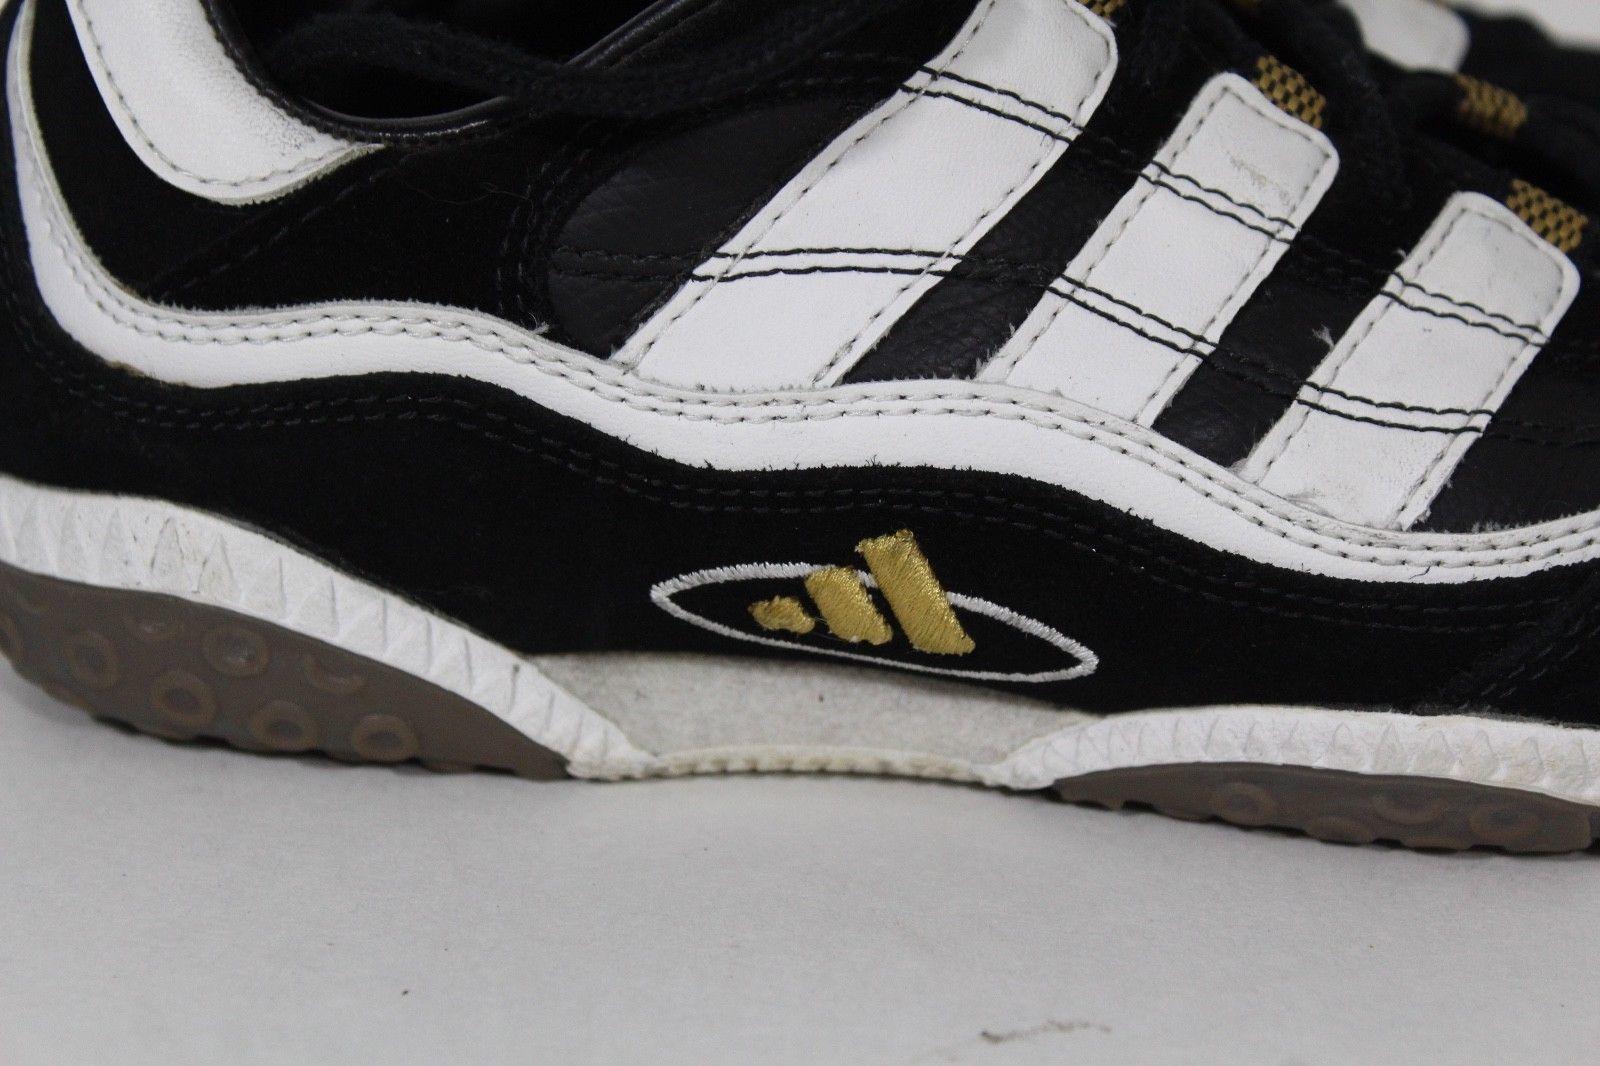 Adidas Adria 90s Turnschuhe